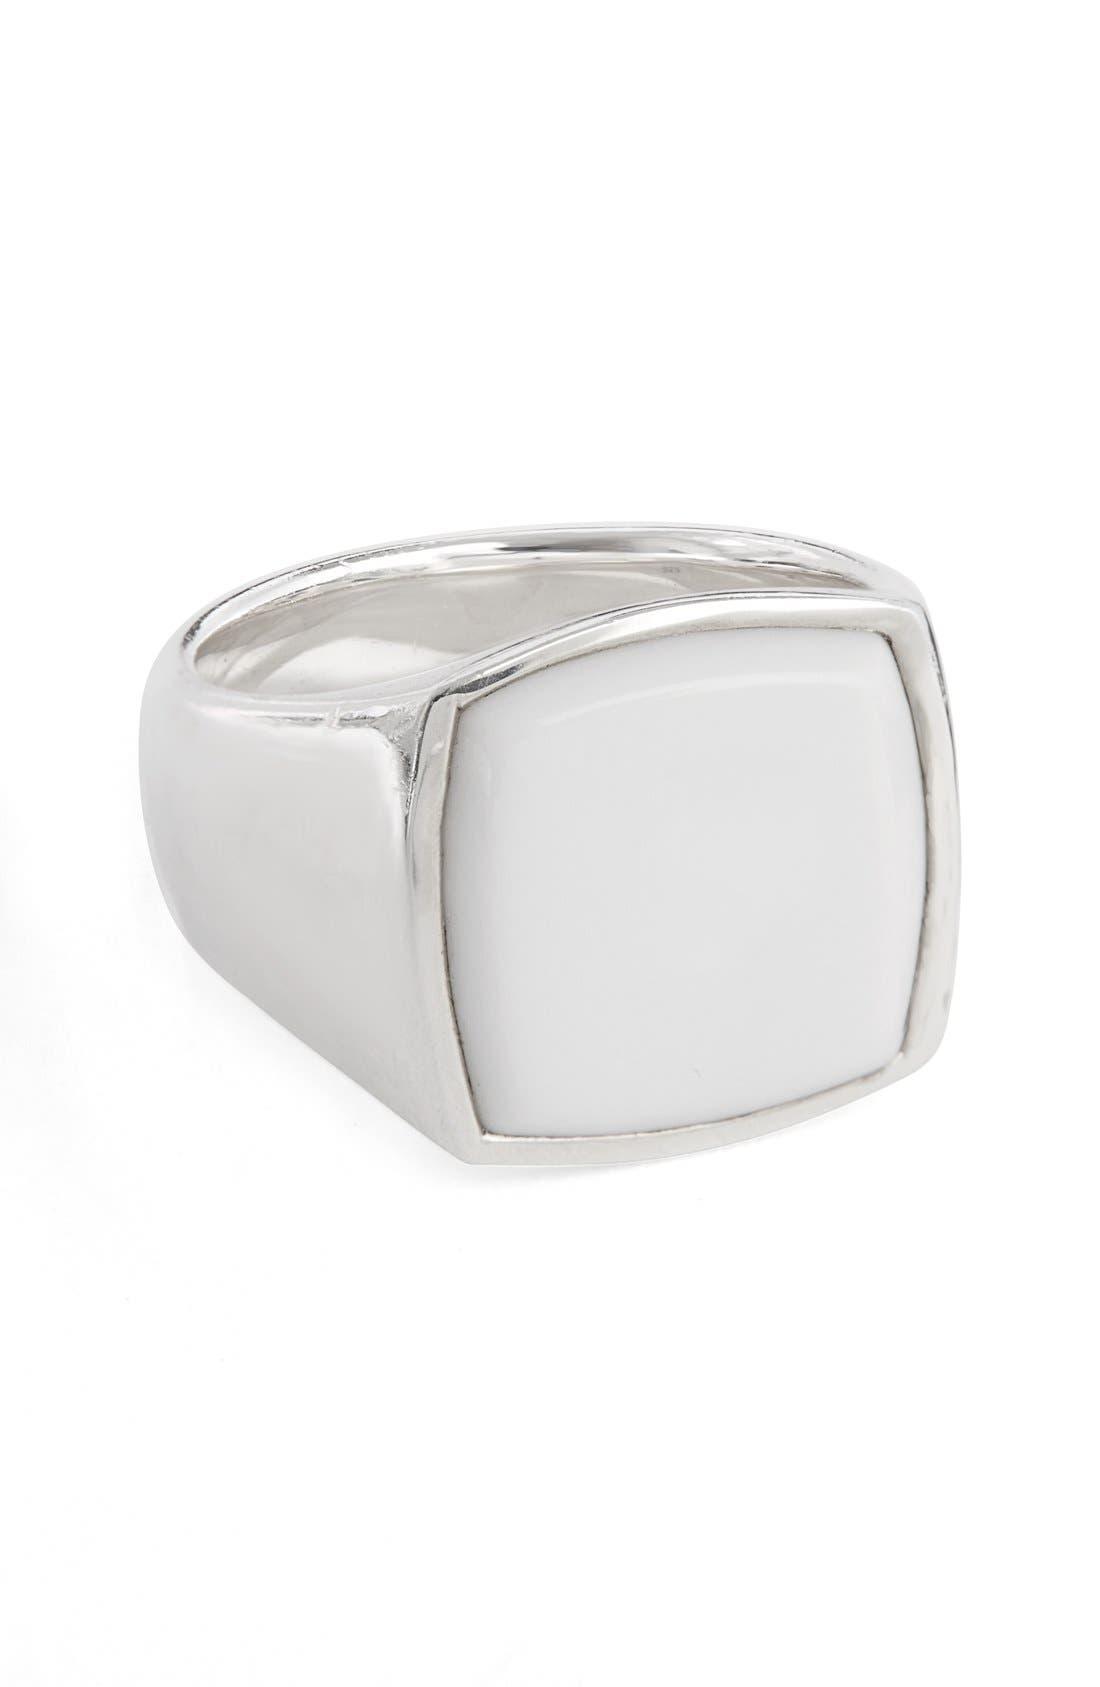 White Agate Cushion Signet Ring,                         Main,                         color, Silver Agate